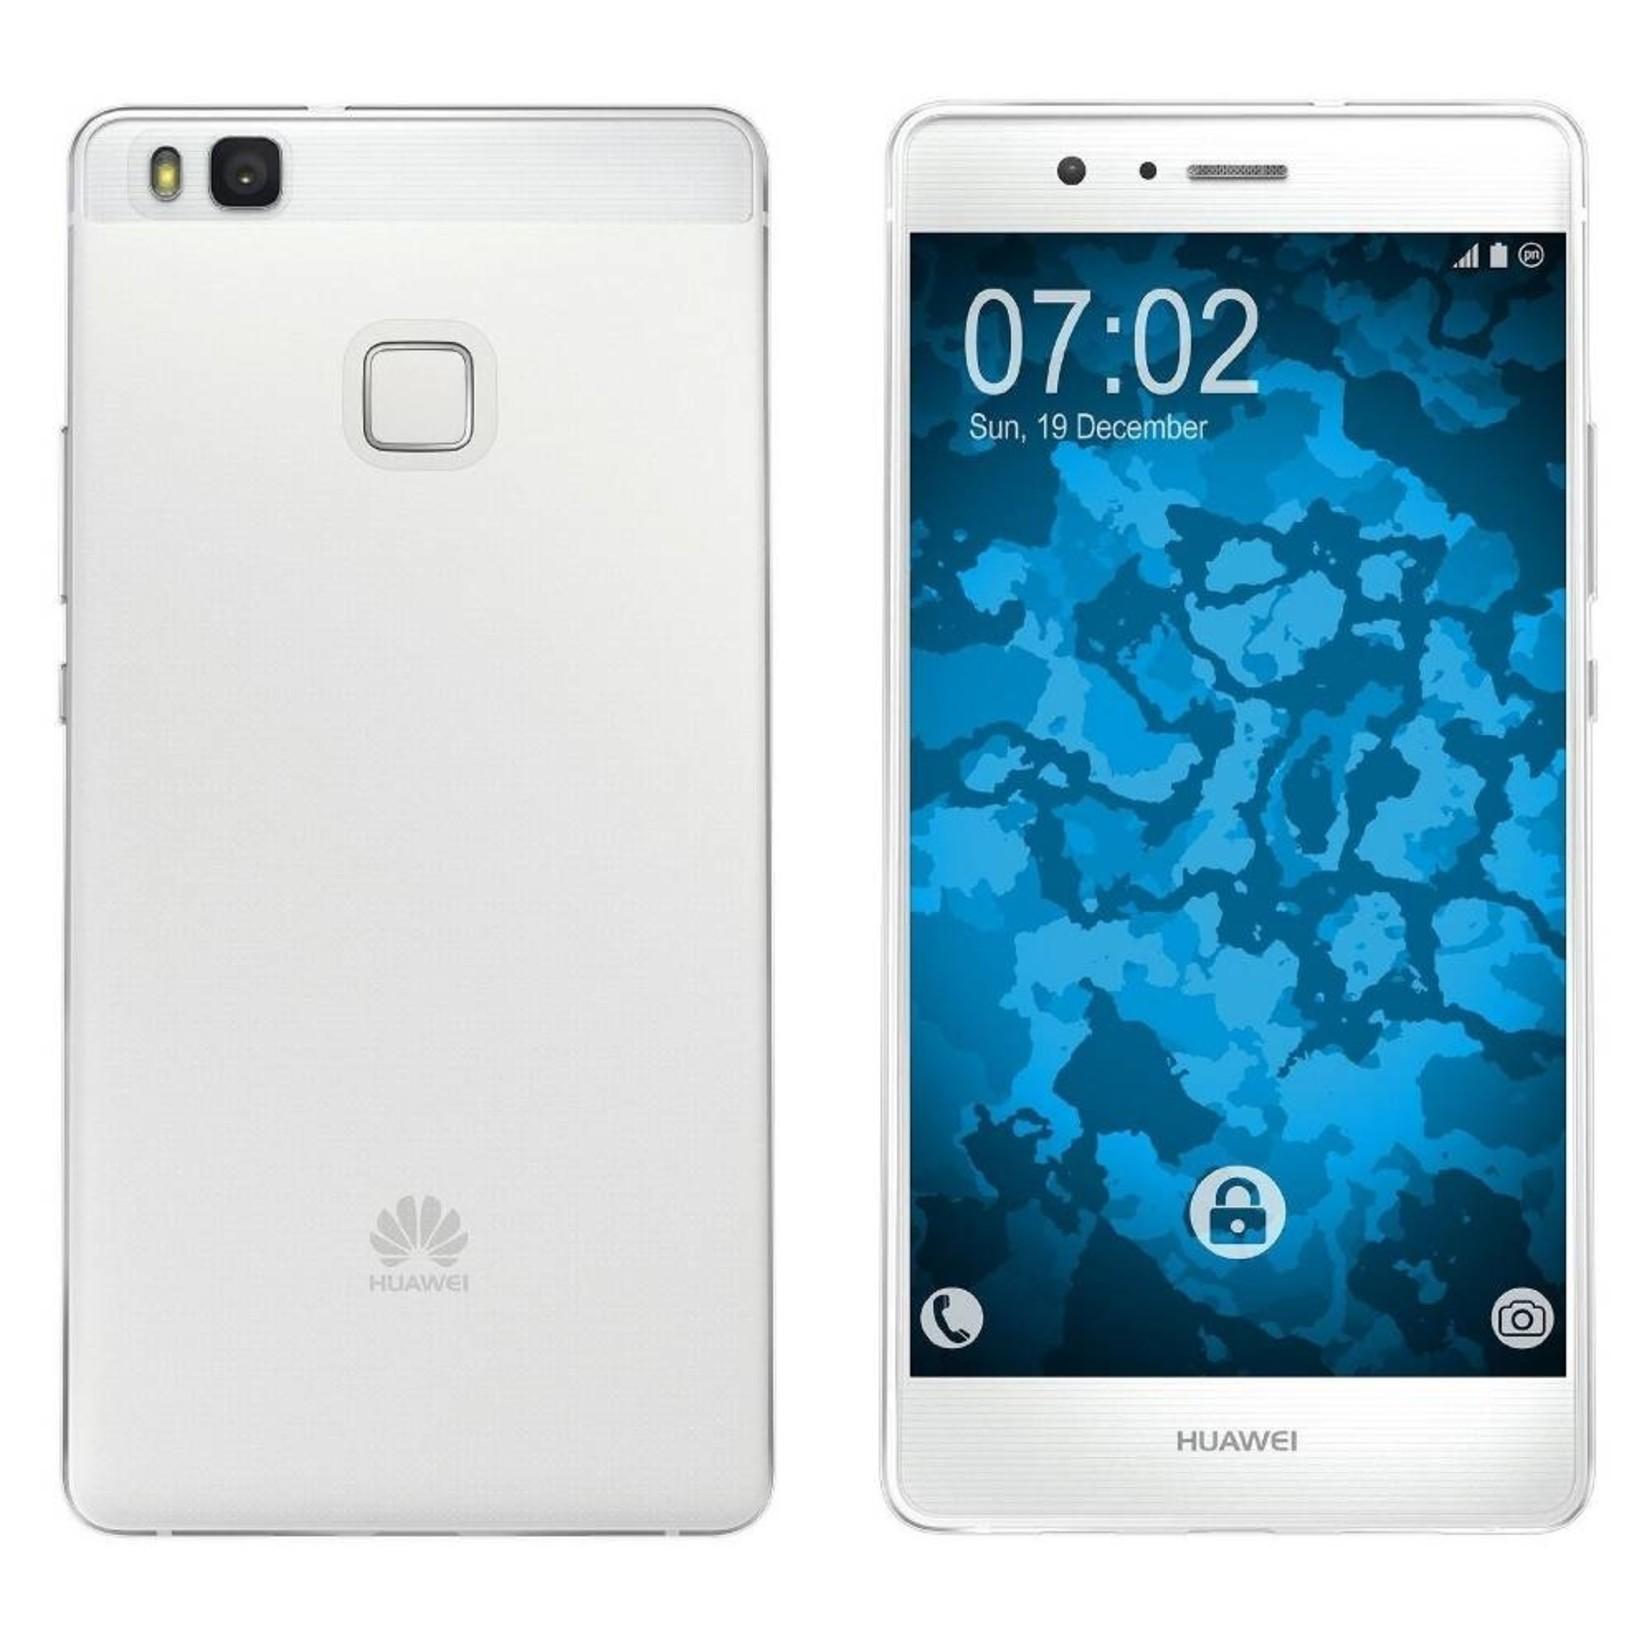 Colorfone Hoesje CoolSkin3T voor Huawei P9 Lite Tr. Wit